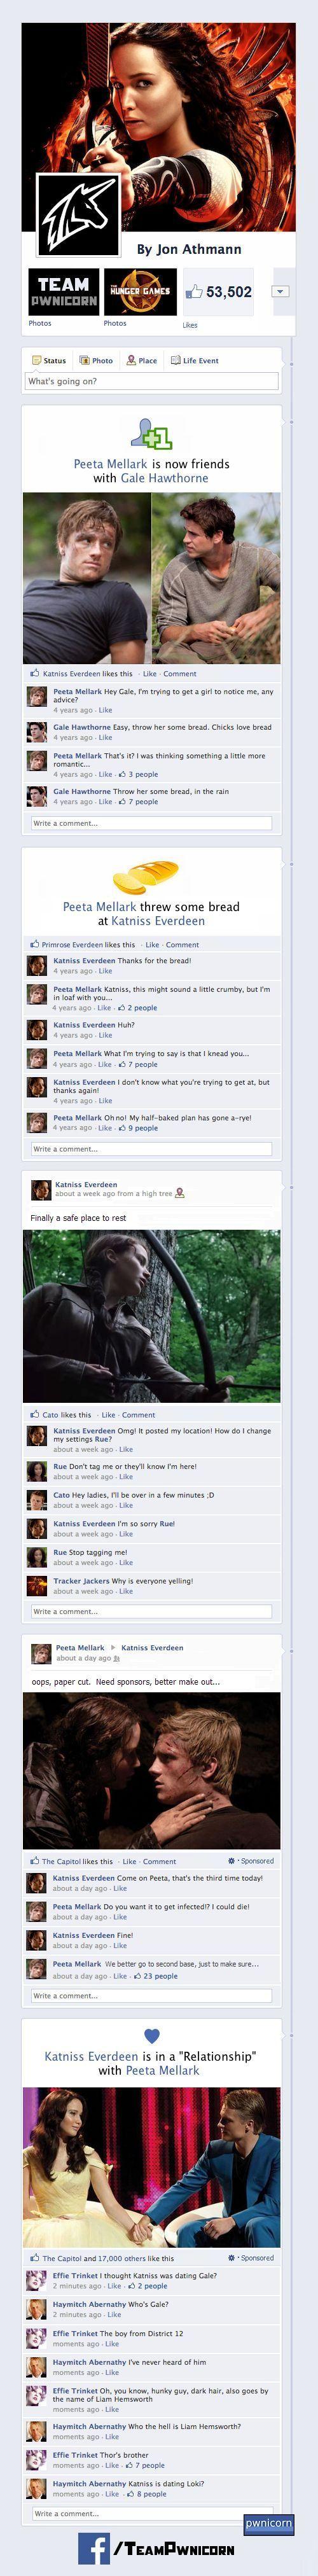 Katniss is dating loki?